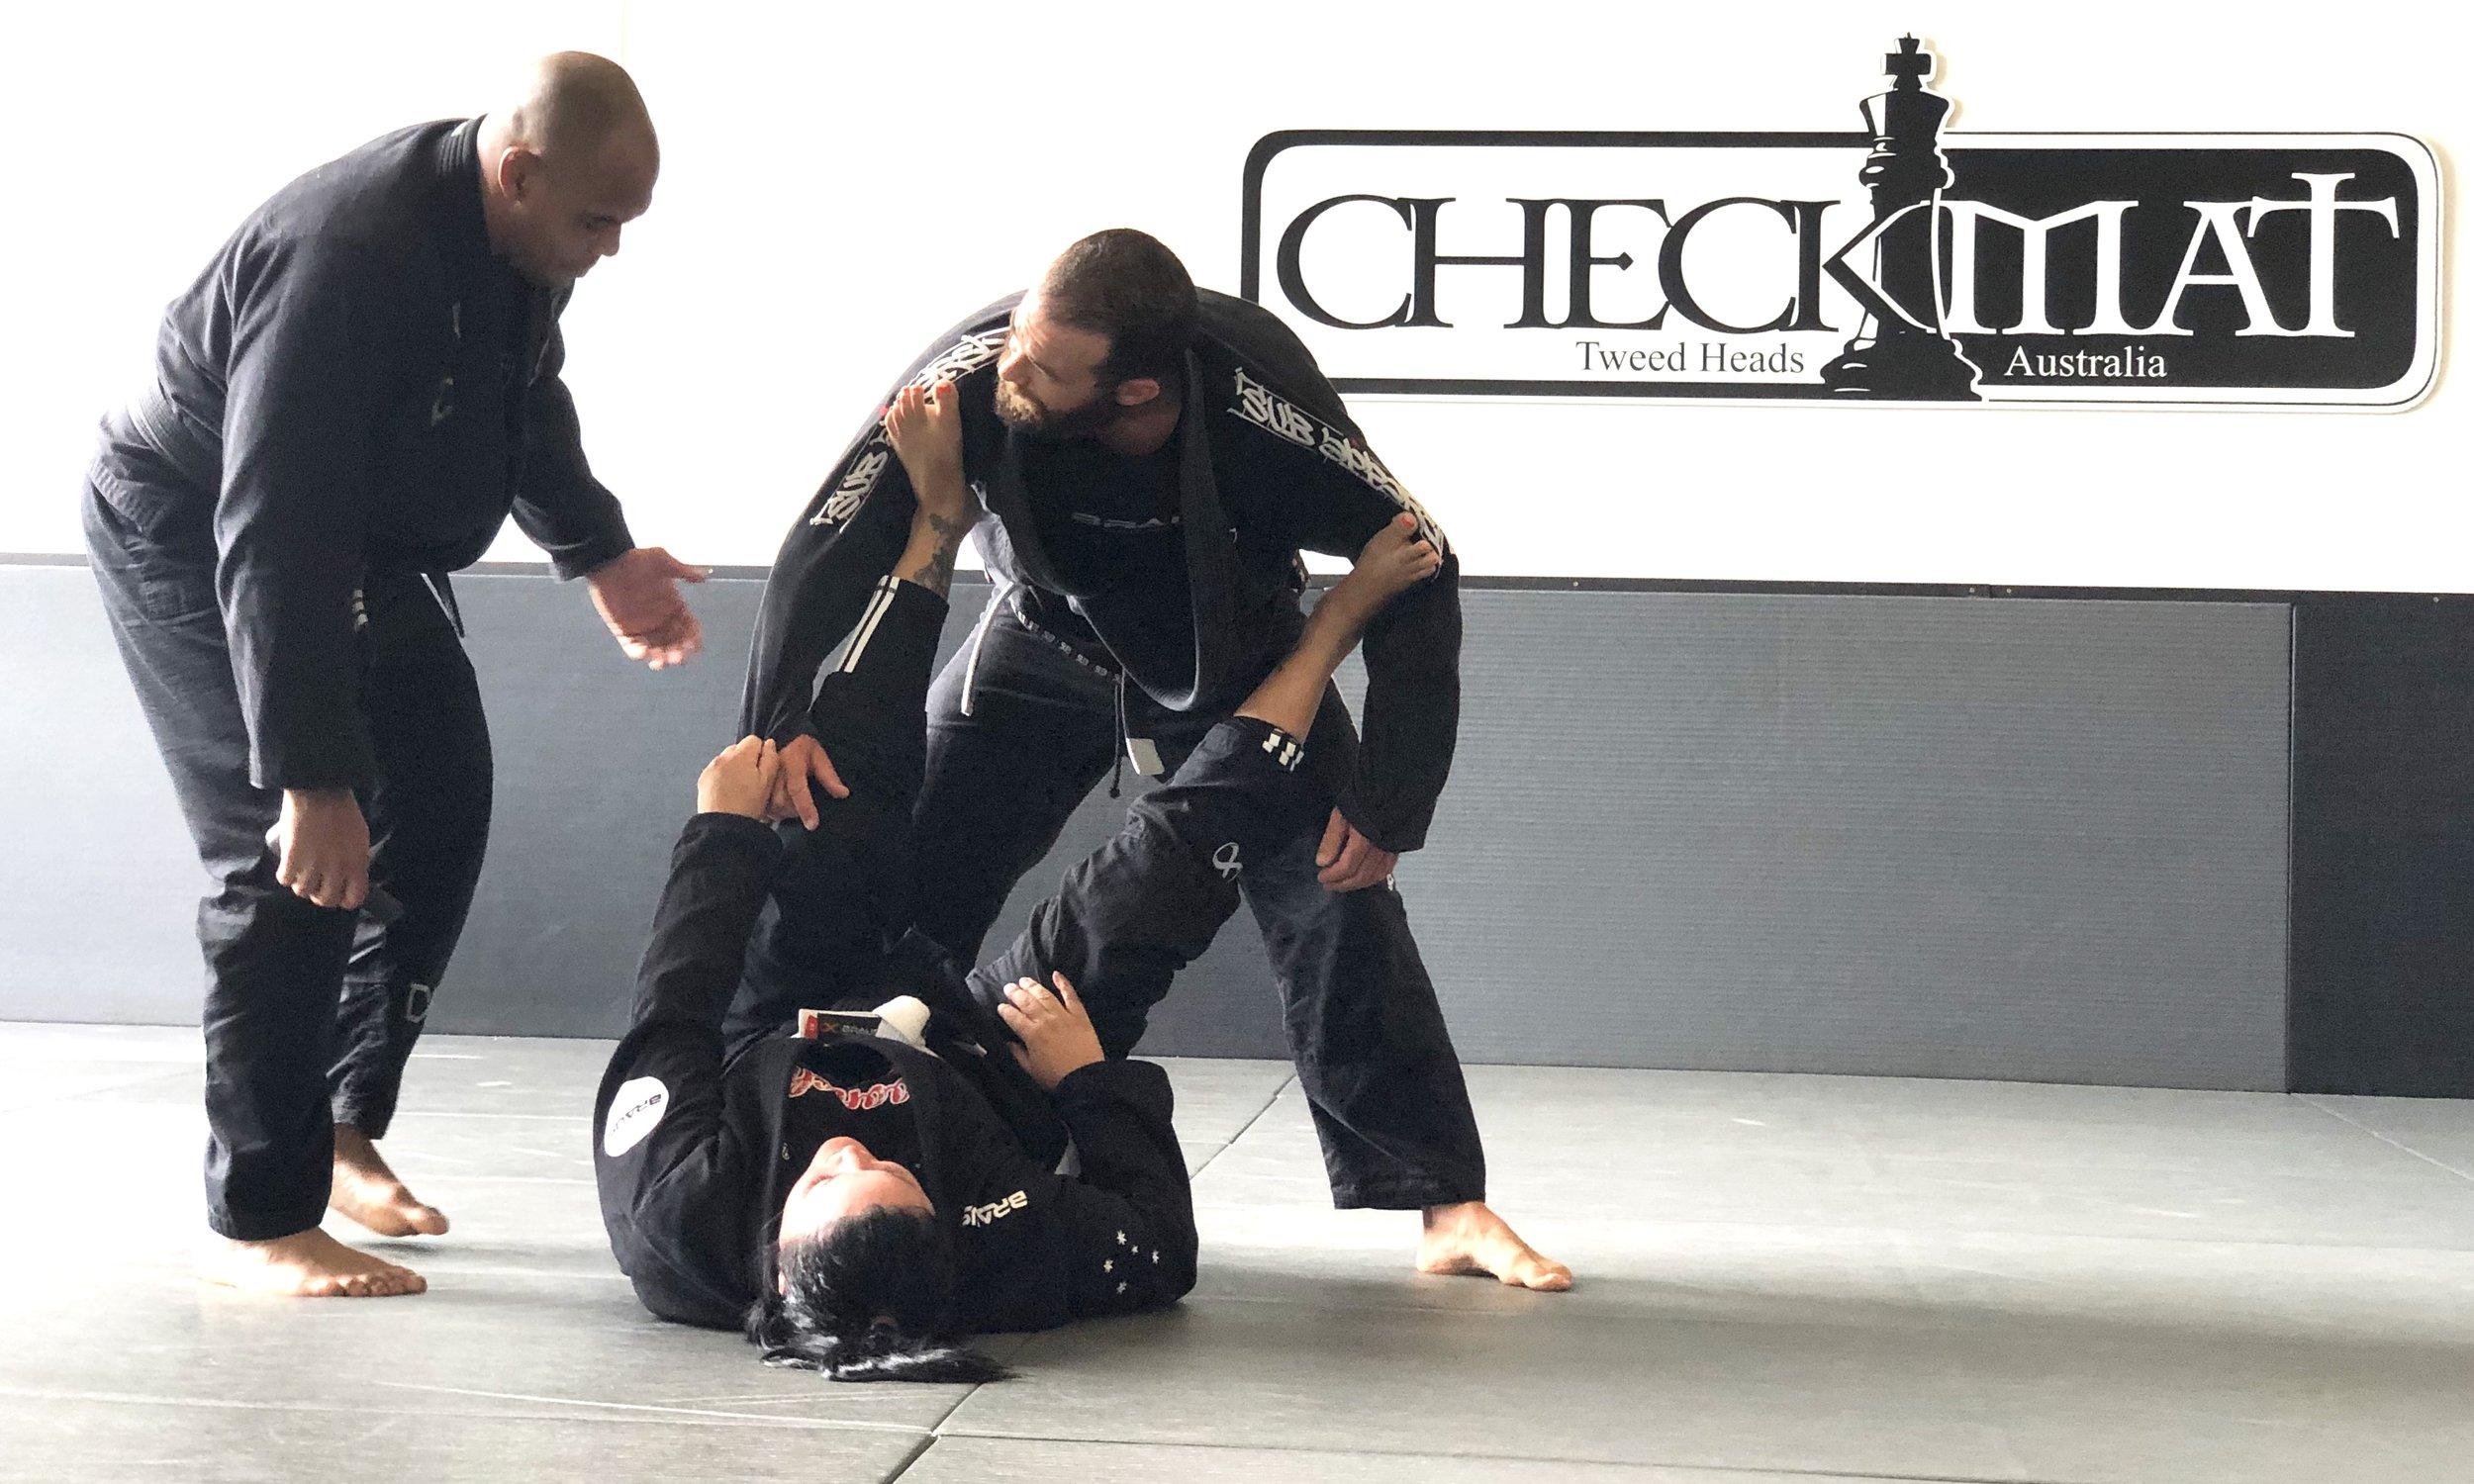 Checkmat Tweed Heads - Family Friendly Jiu Jitsu